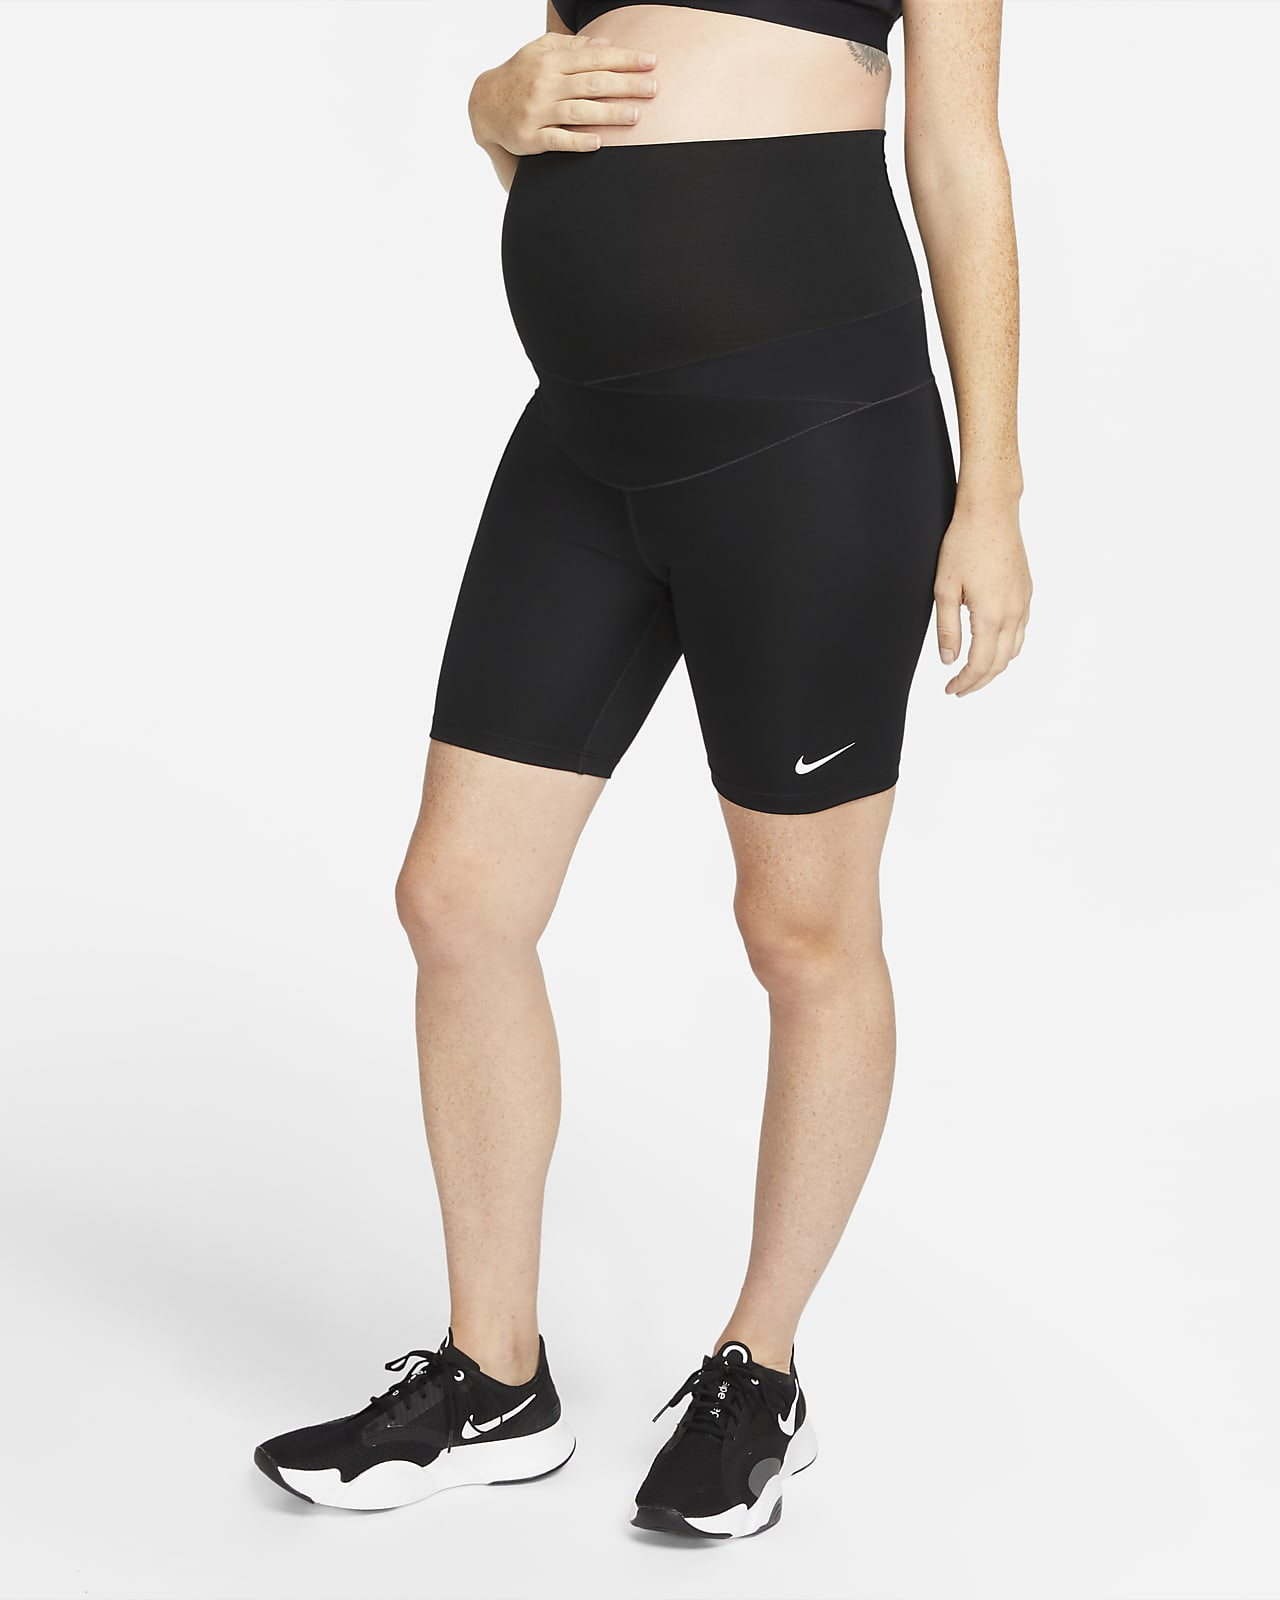 Nike One (M) Dri-FIT Women's 18cm (approx.) Maternity Shorts